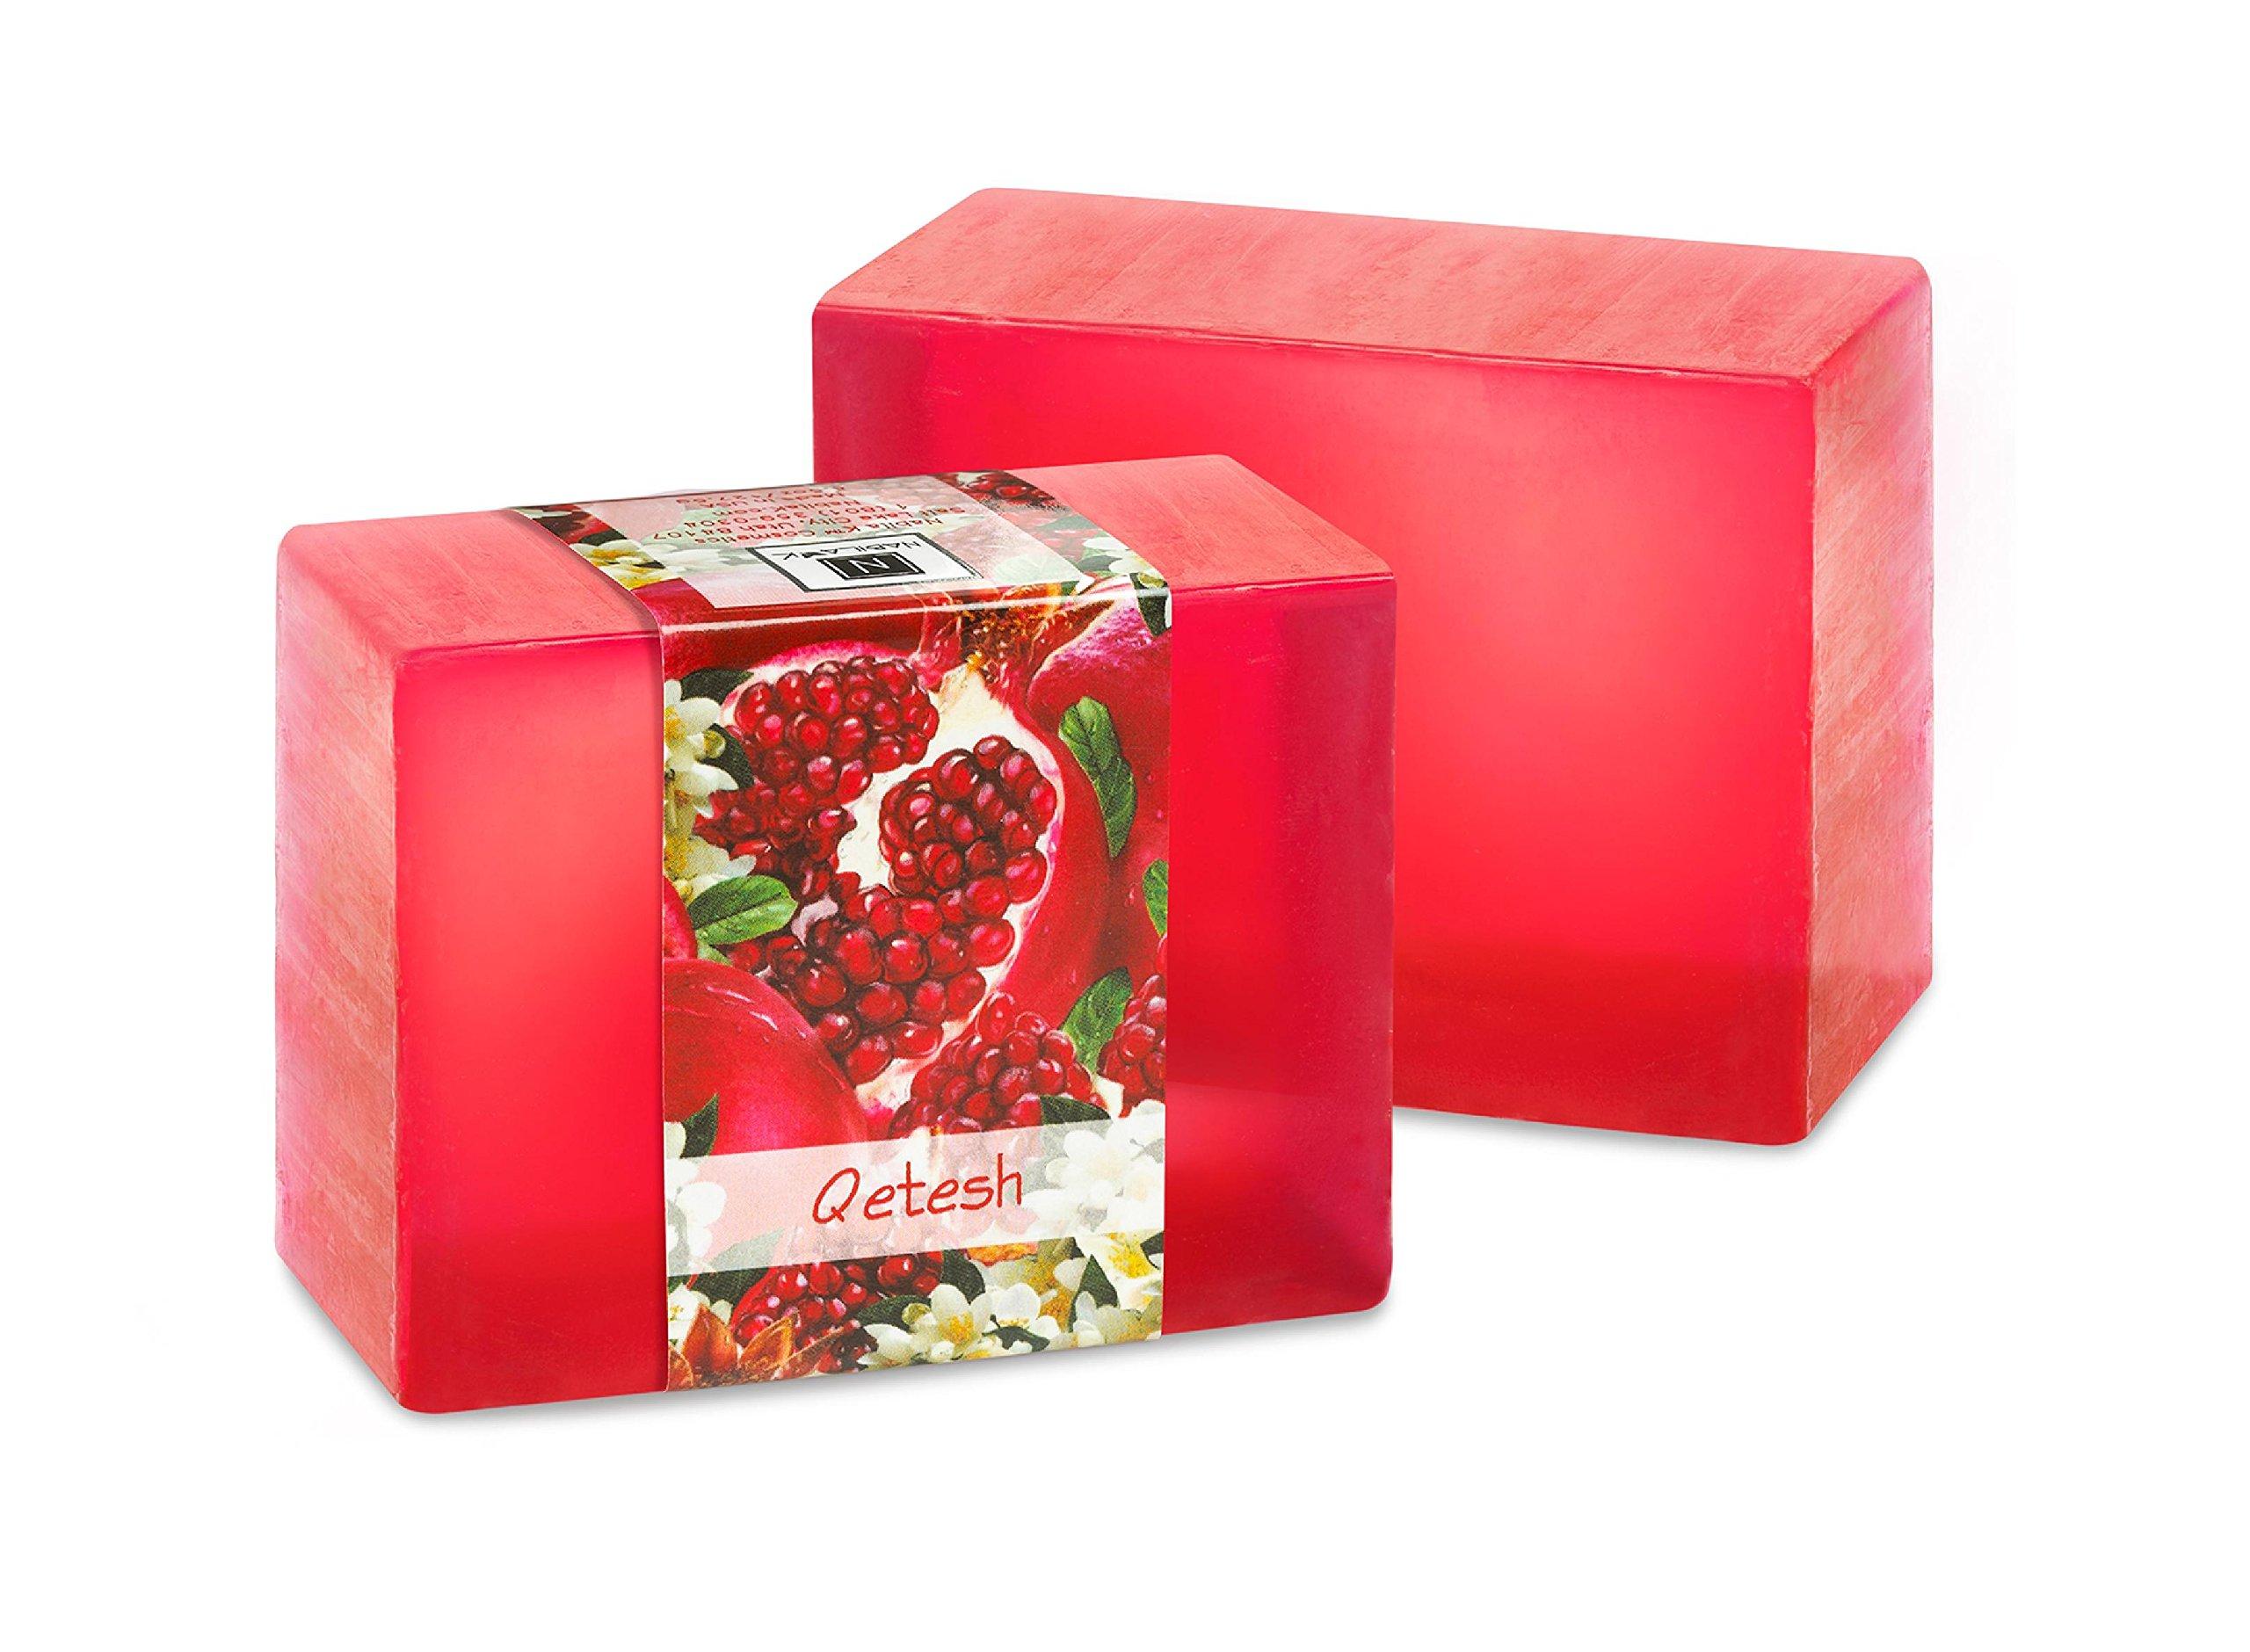 N Nabila K Vegetable Glycerin Bar Soap, Qetesh, Single Bar, 4.5oz/127.5g each